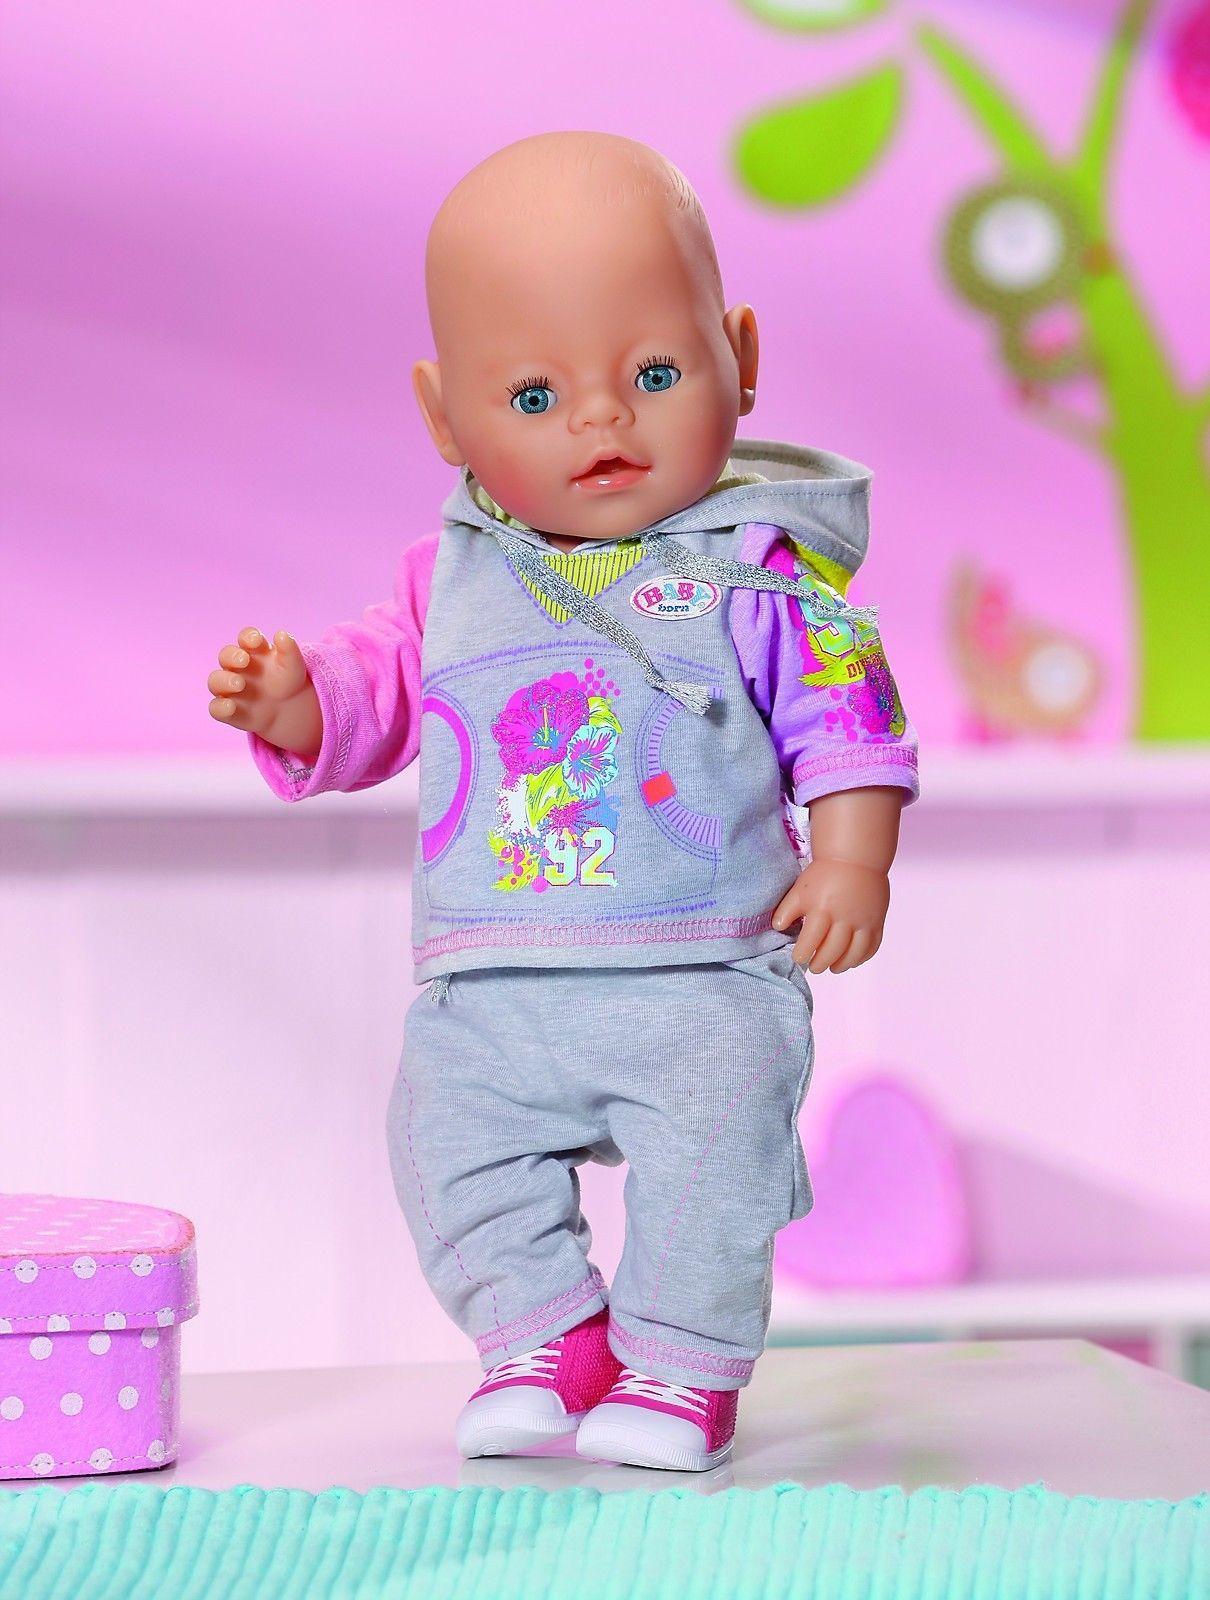 Zapf Creation Baby Born Deluxe Joggin Set 821053 Grau Spielzeug Brandtoys Ebay Baby Geboren Zapf Creation Baby